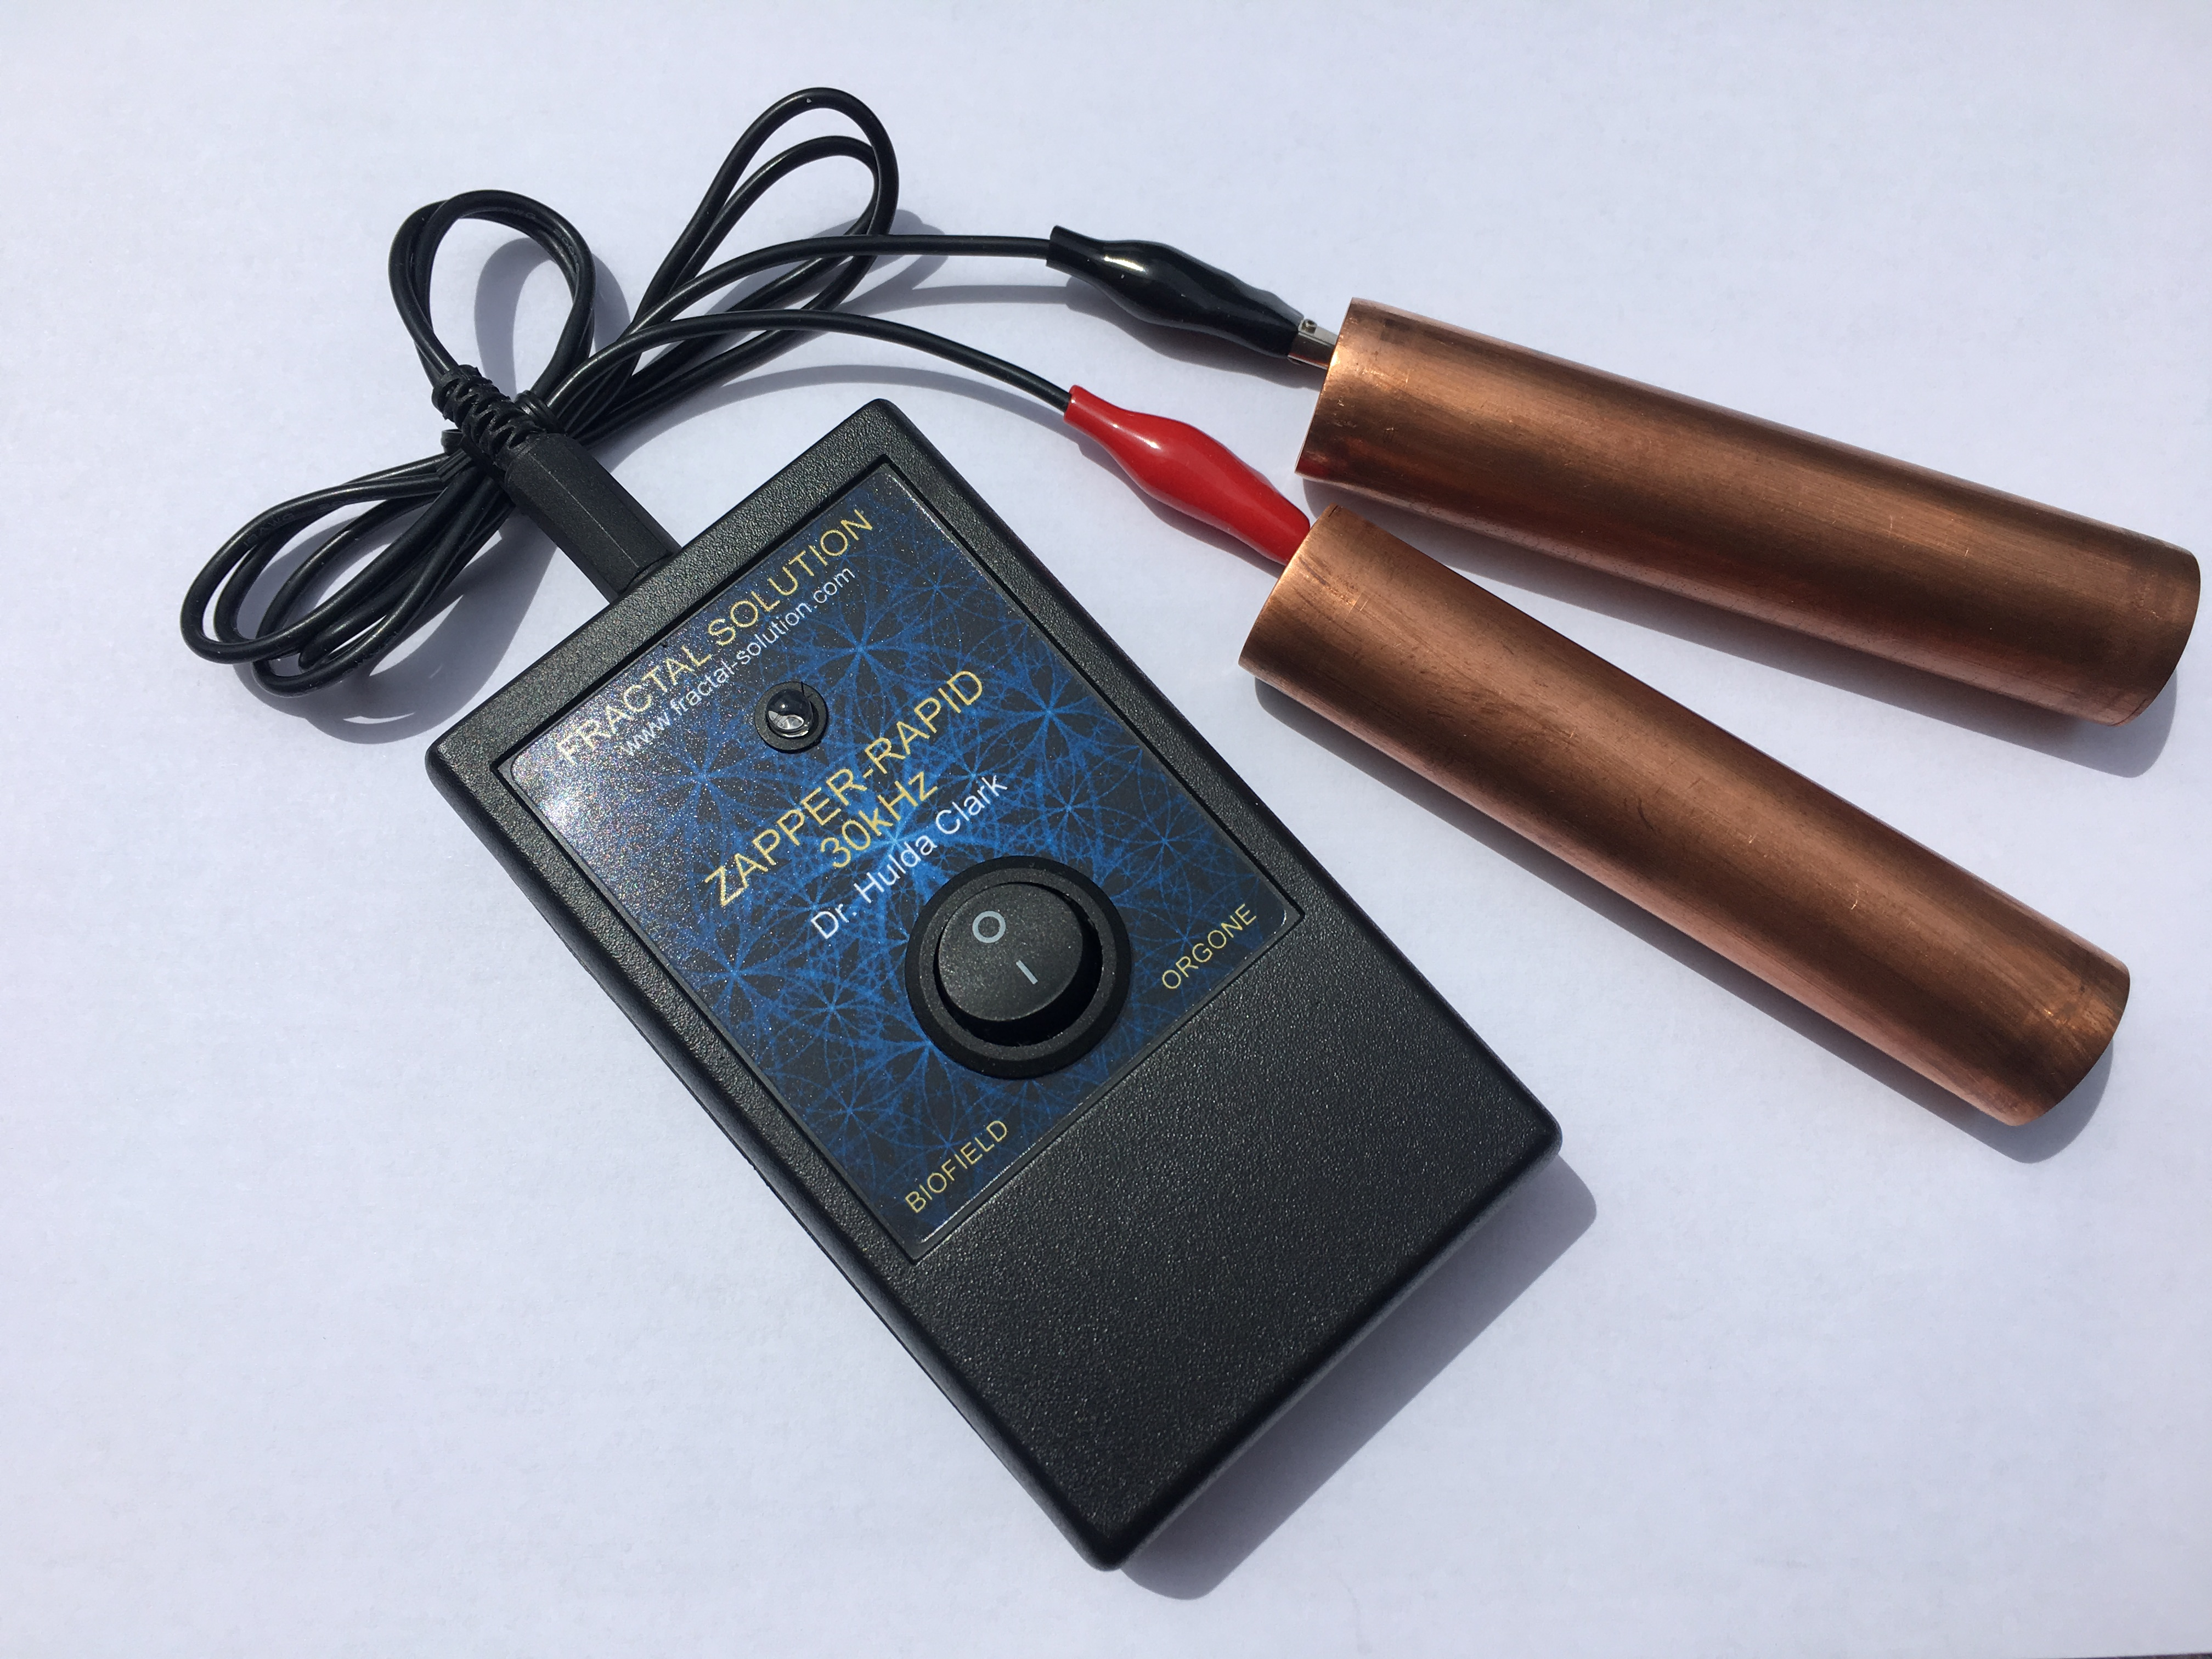 Zapper Rapid 30 kHz Orgone With Copper Handholds